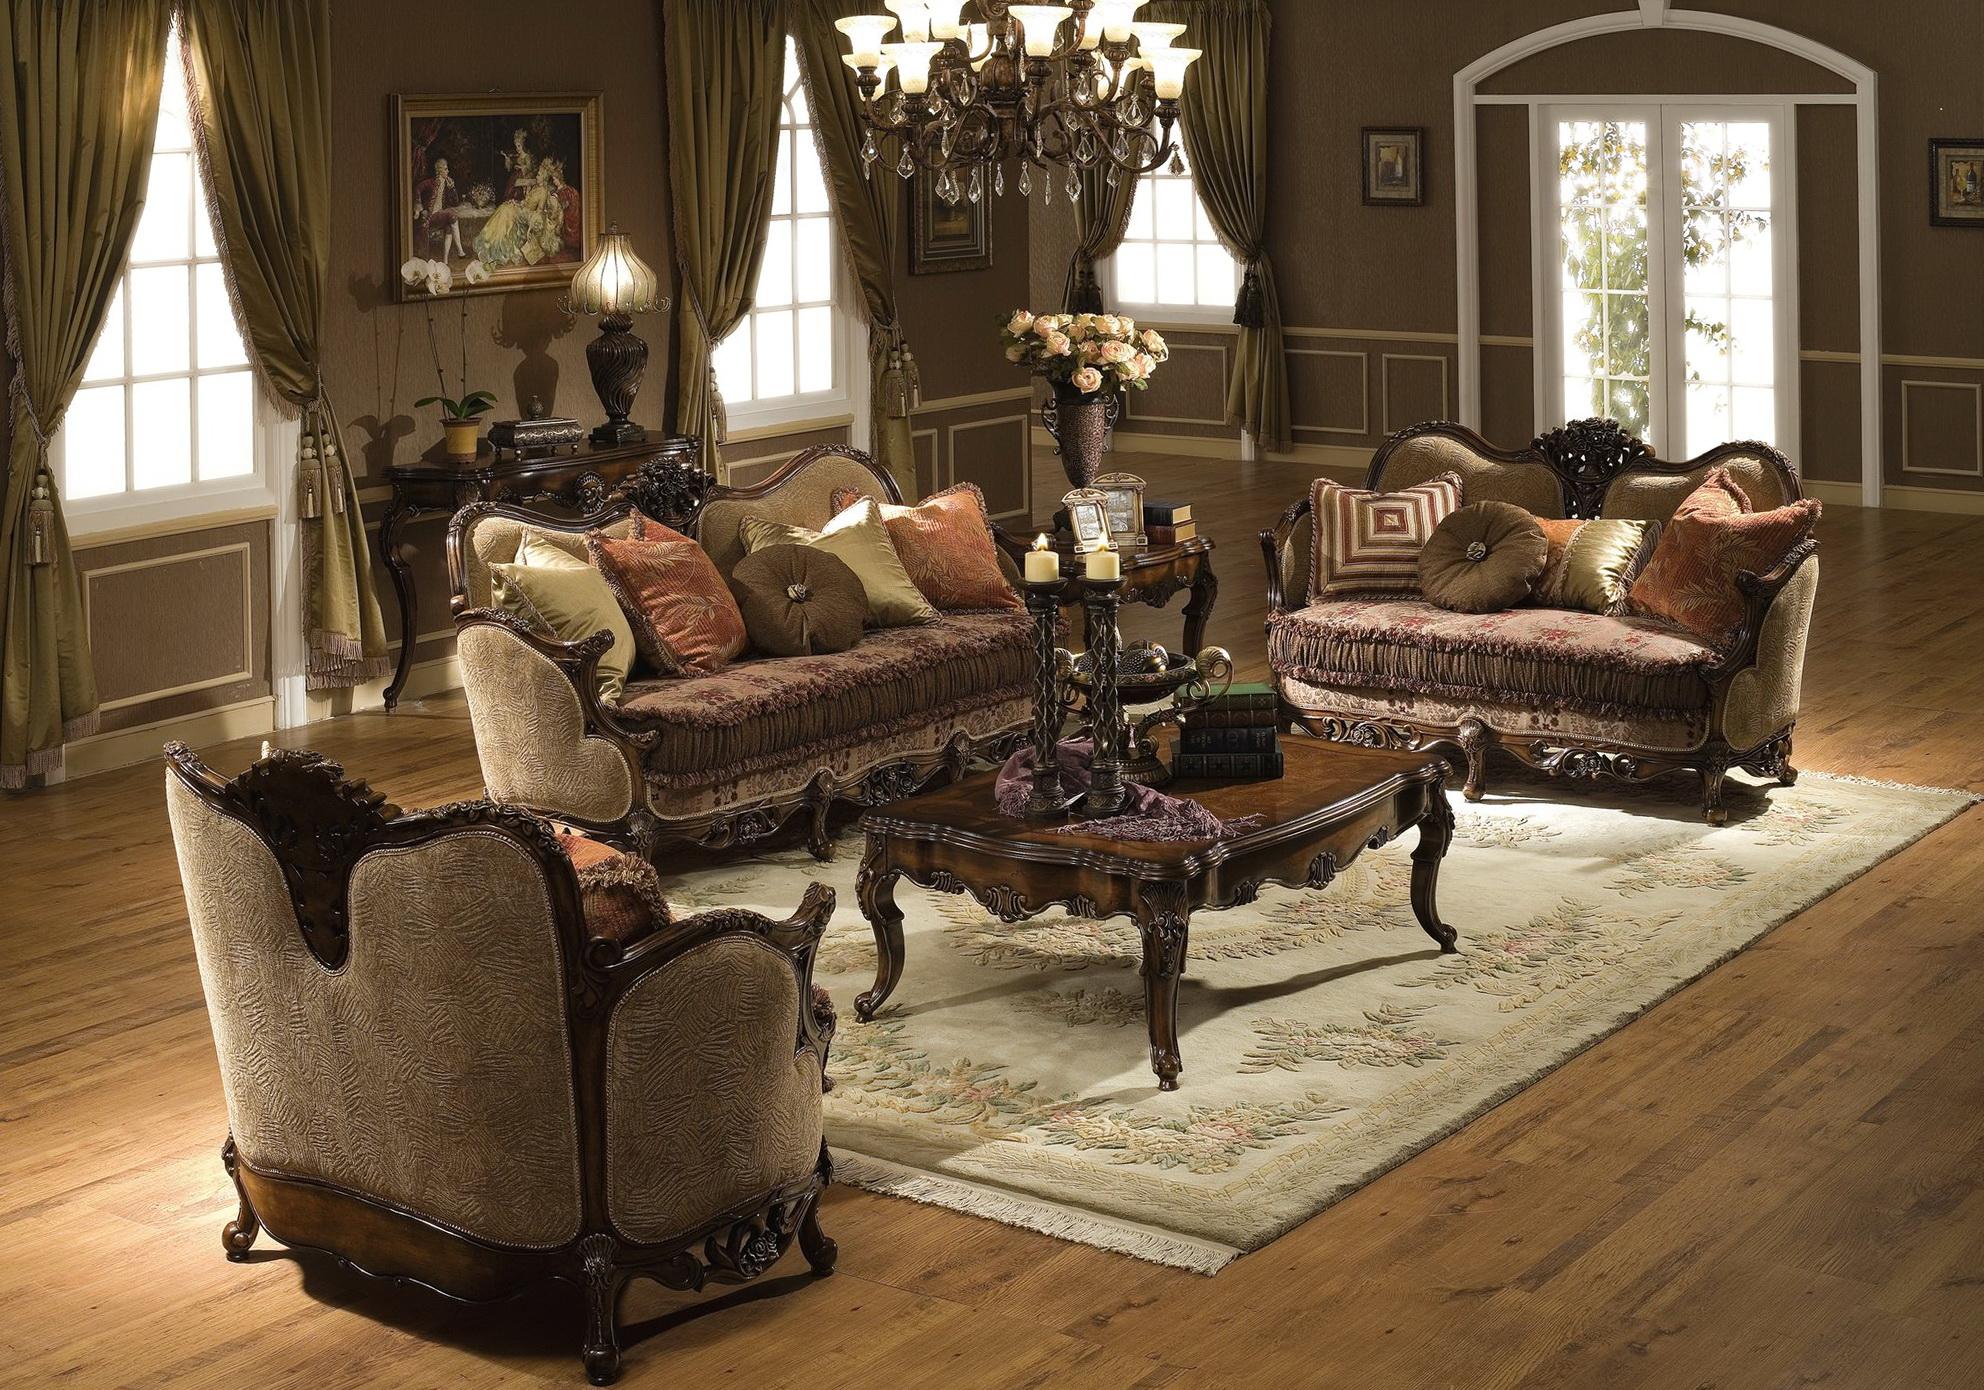 Living Room Chandelier Size